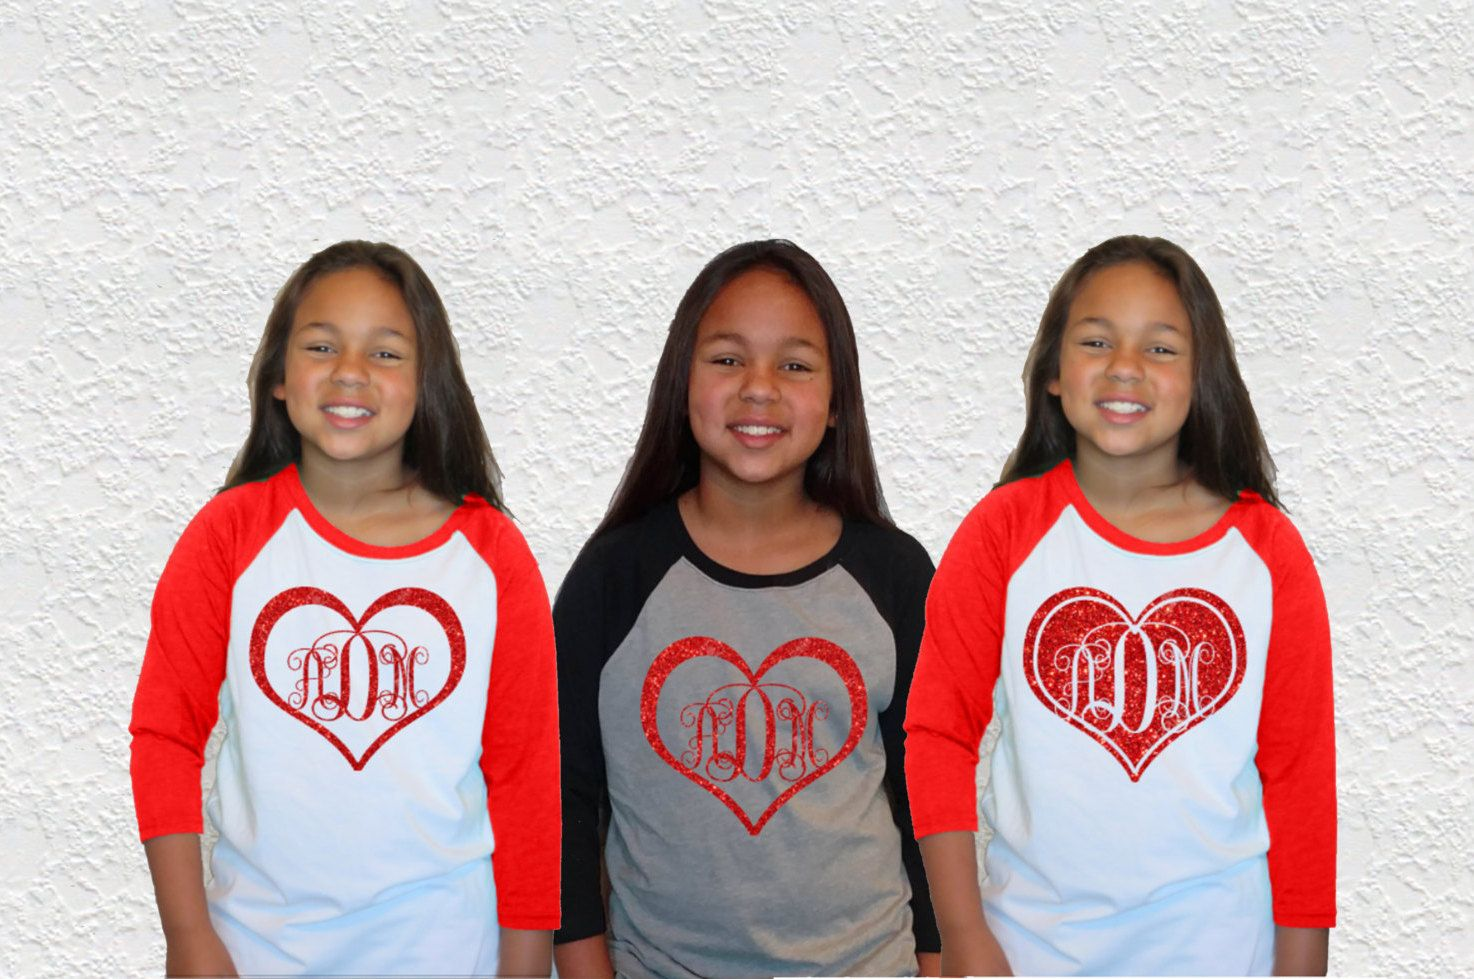 Valentine shirt|Valentine Heart Monogram Kids Glitter Baseball Raglan Tee|Youth|Kids Raglan Baseball t-shirt|Glitter Monogram tee by GavinsAllyeDesigns on Etsy